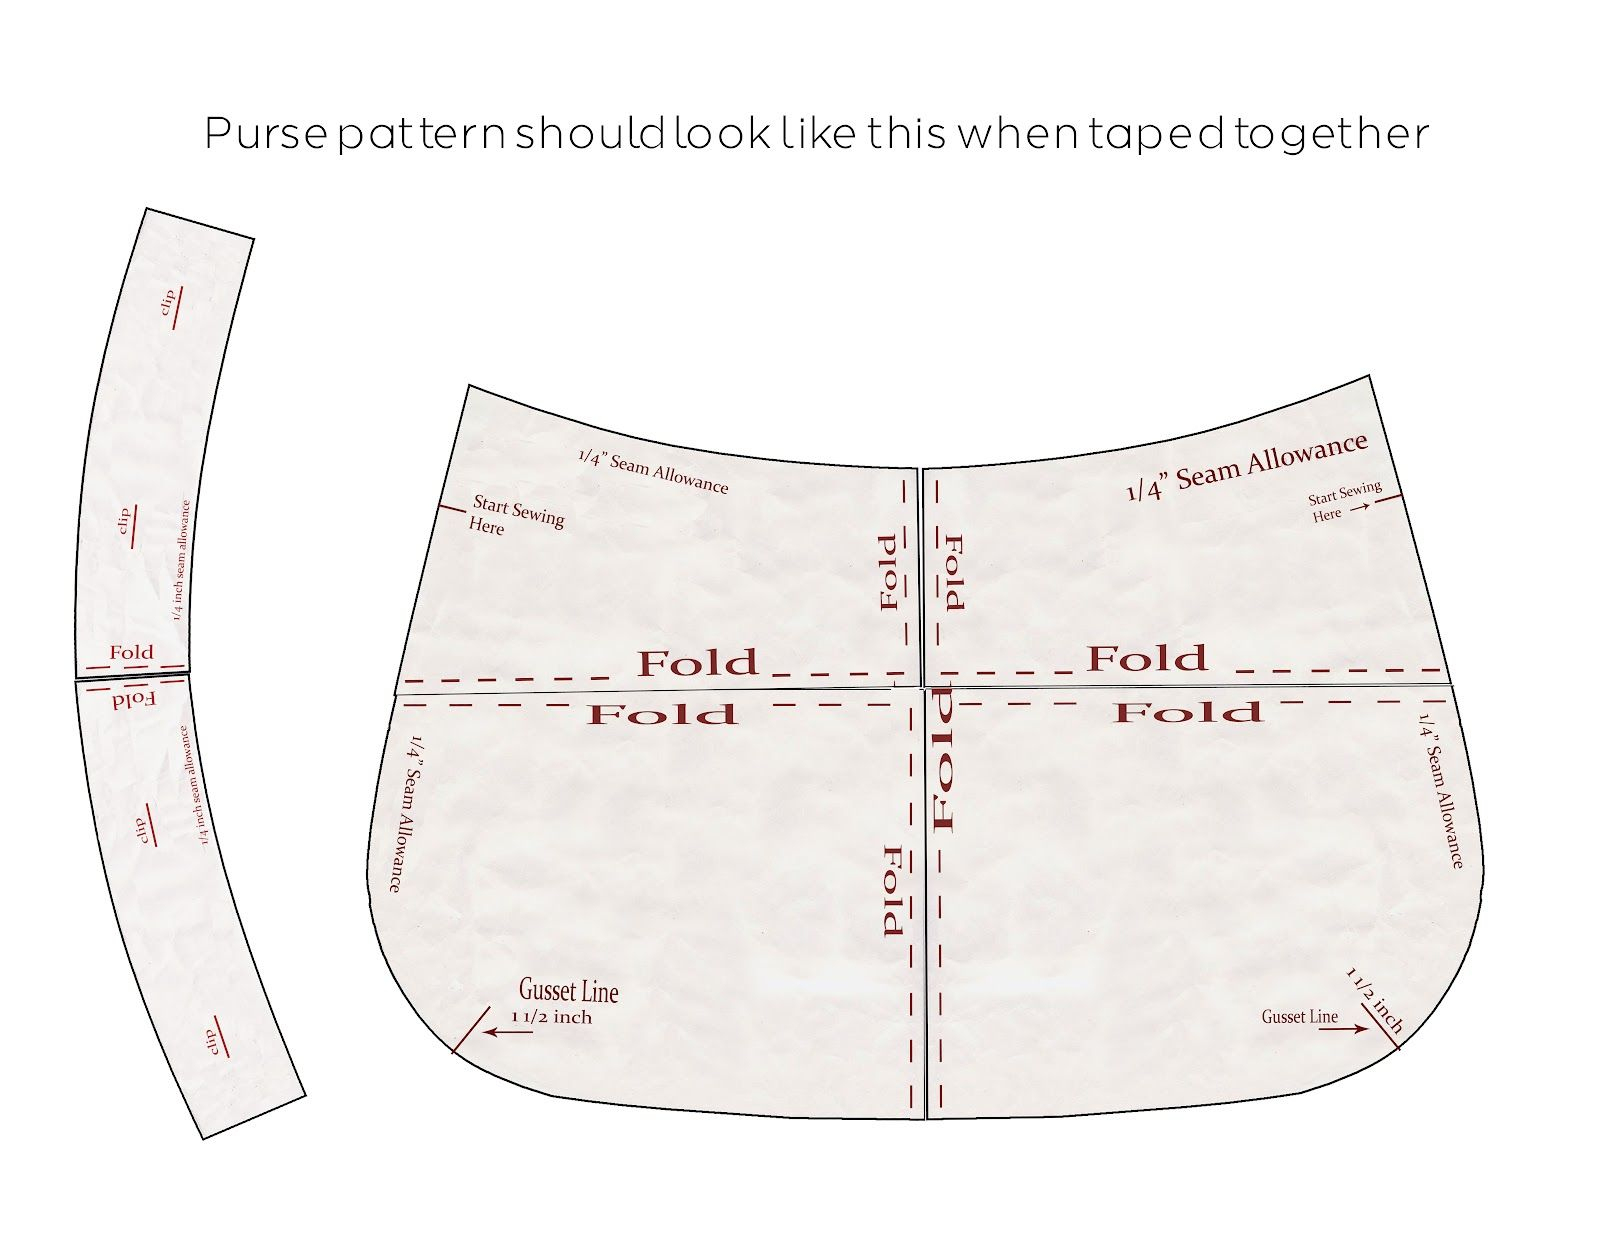 Purse Patterns Print Free    Download The Pattern Pieces To Your - Free Printable Purse Patterns To Sew